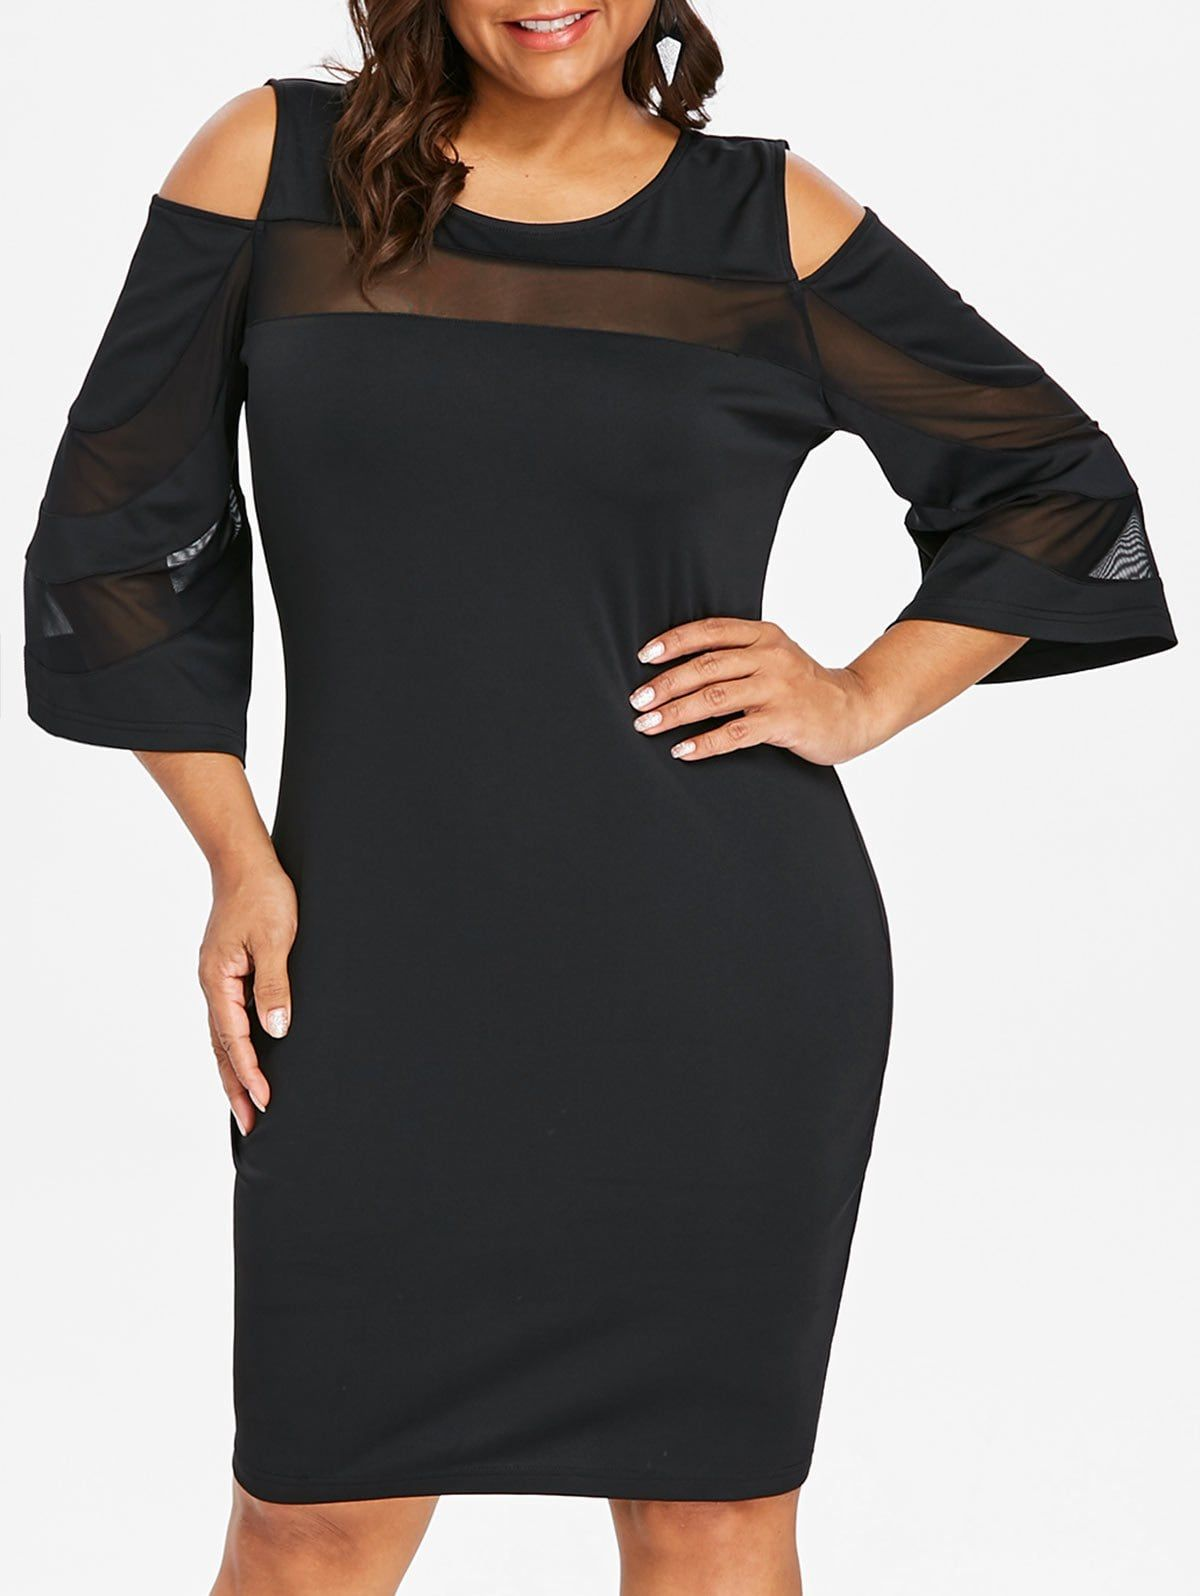 da5c20c37b1 Cold Shoulder Plus Size Mesh Panel Knee Length Dress